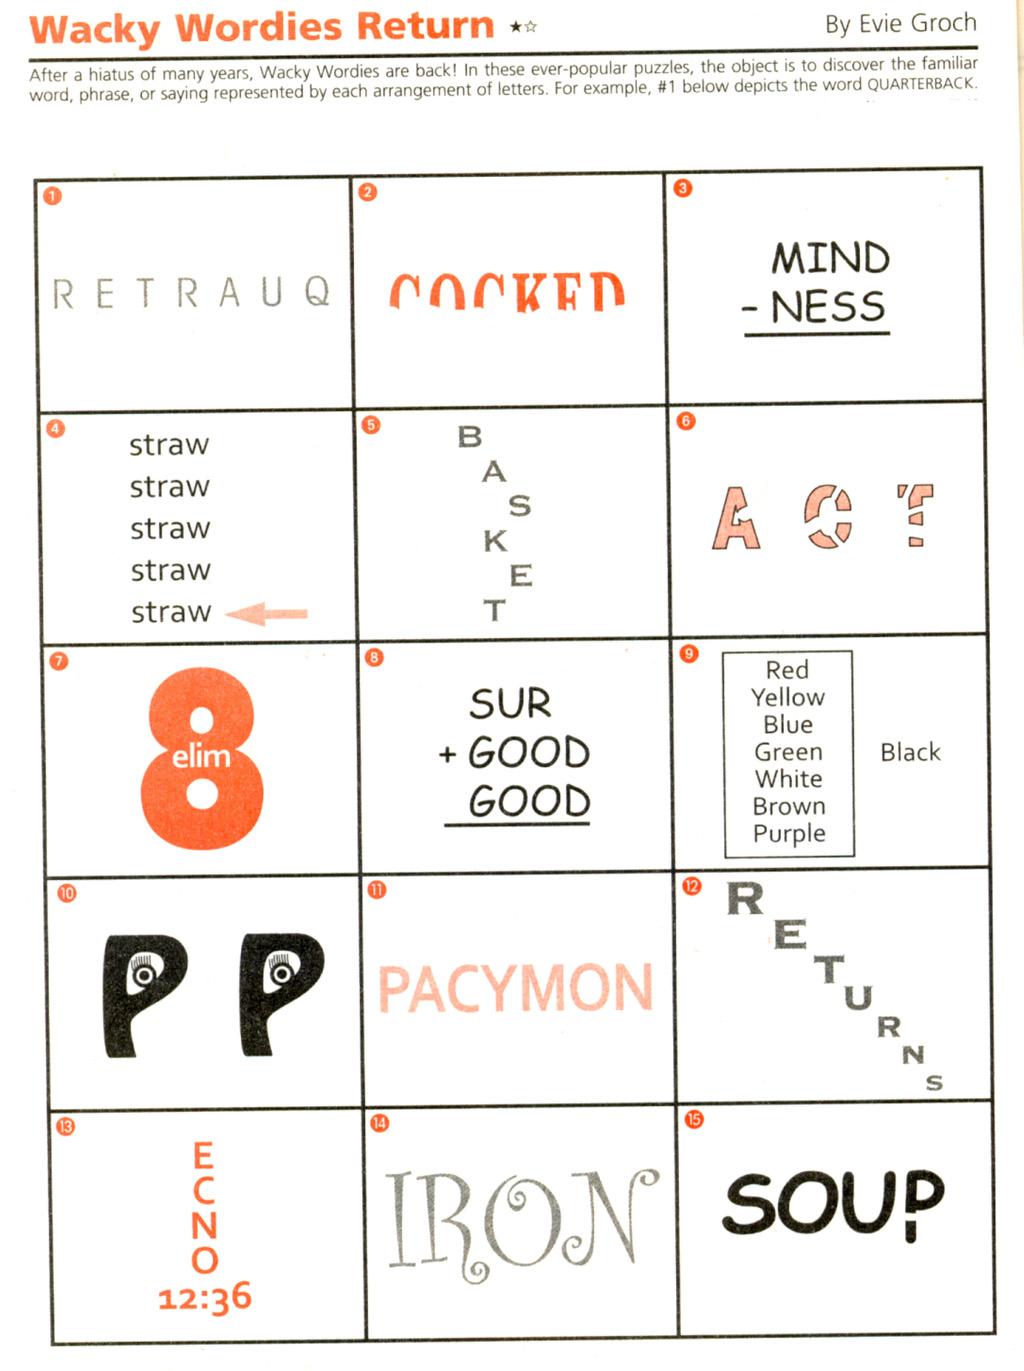 Wackie Wor S 68 Wacky Words Puzzle Word Puzzles Brain